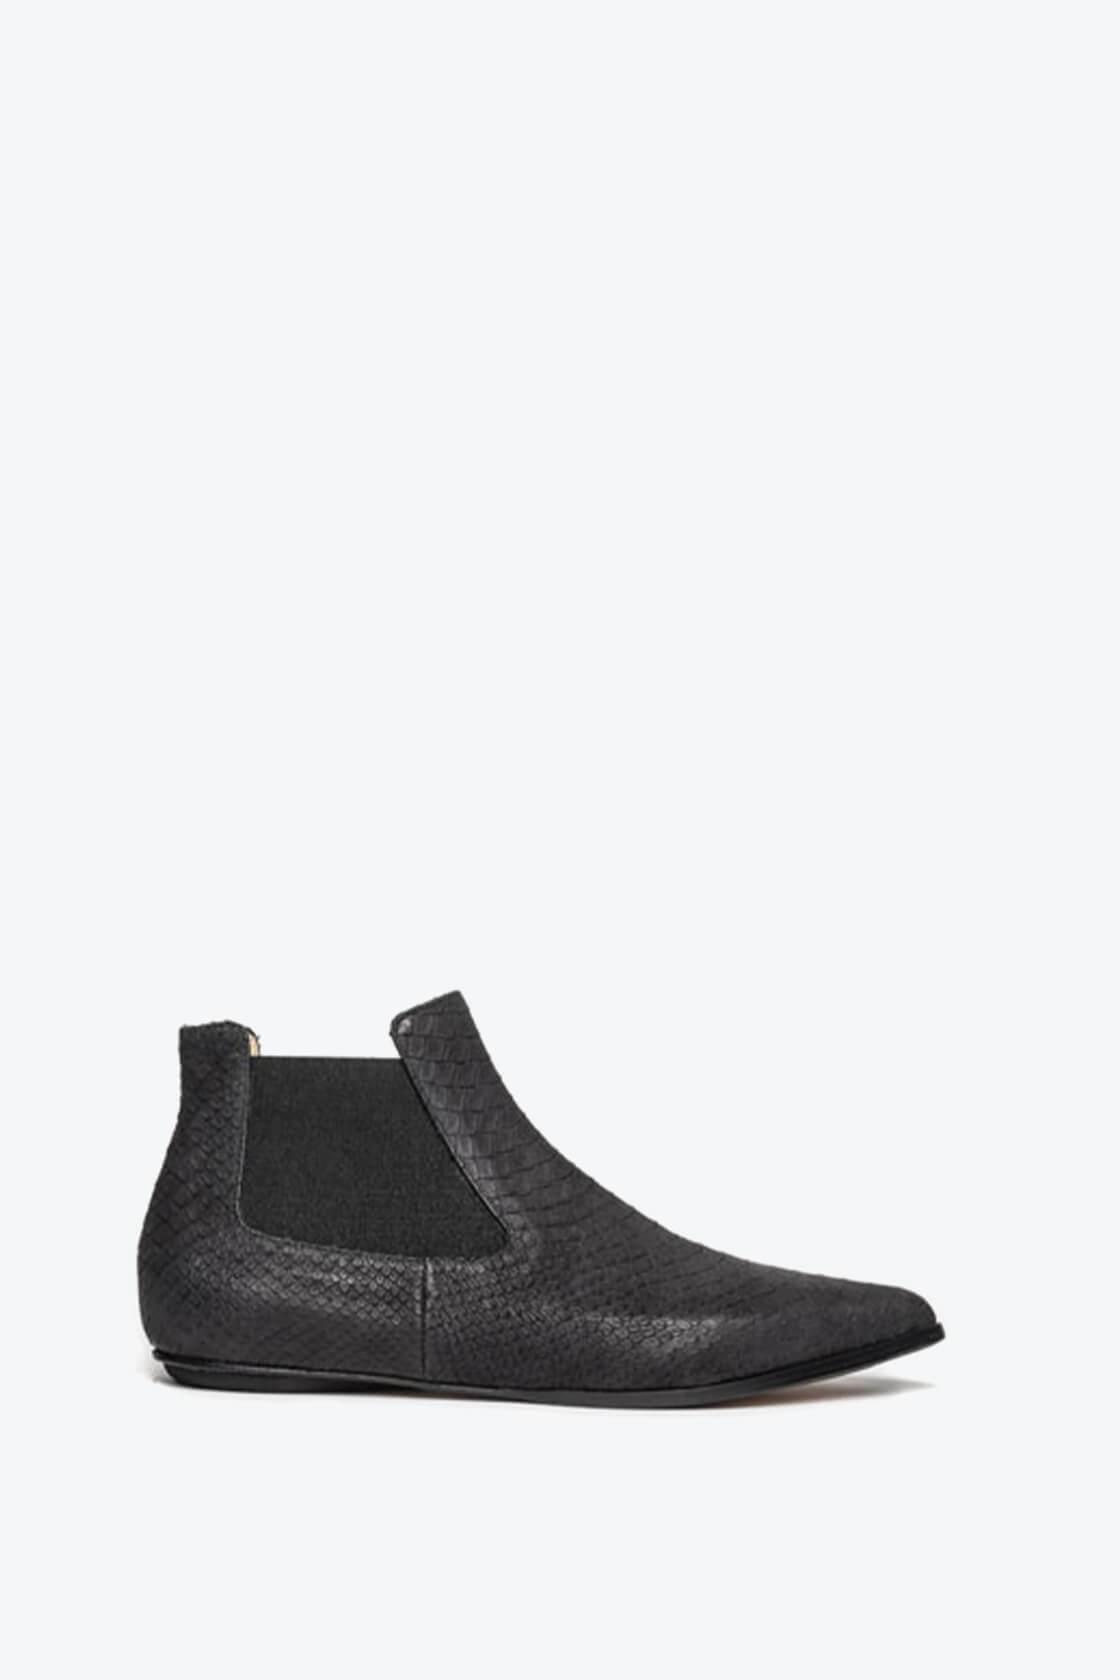 EJK0000042 Niki chelsea boots black python 1